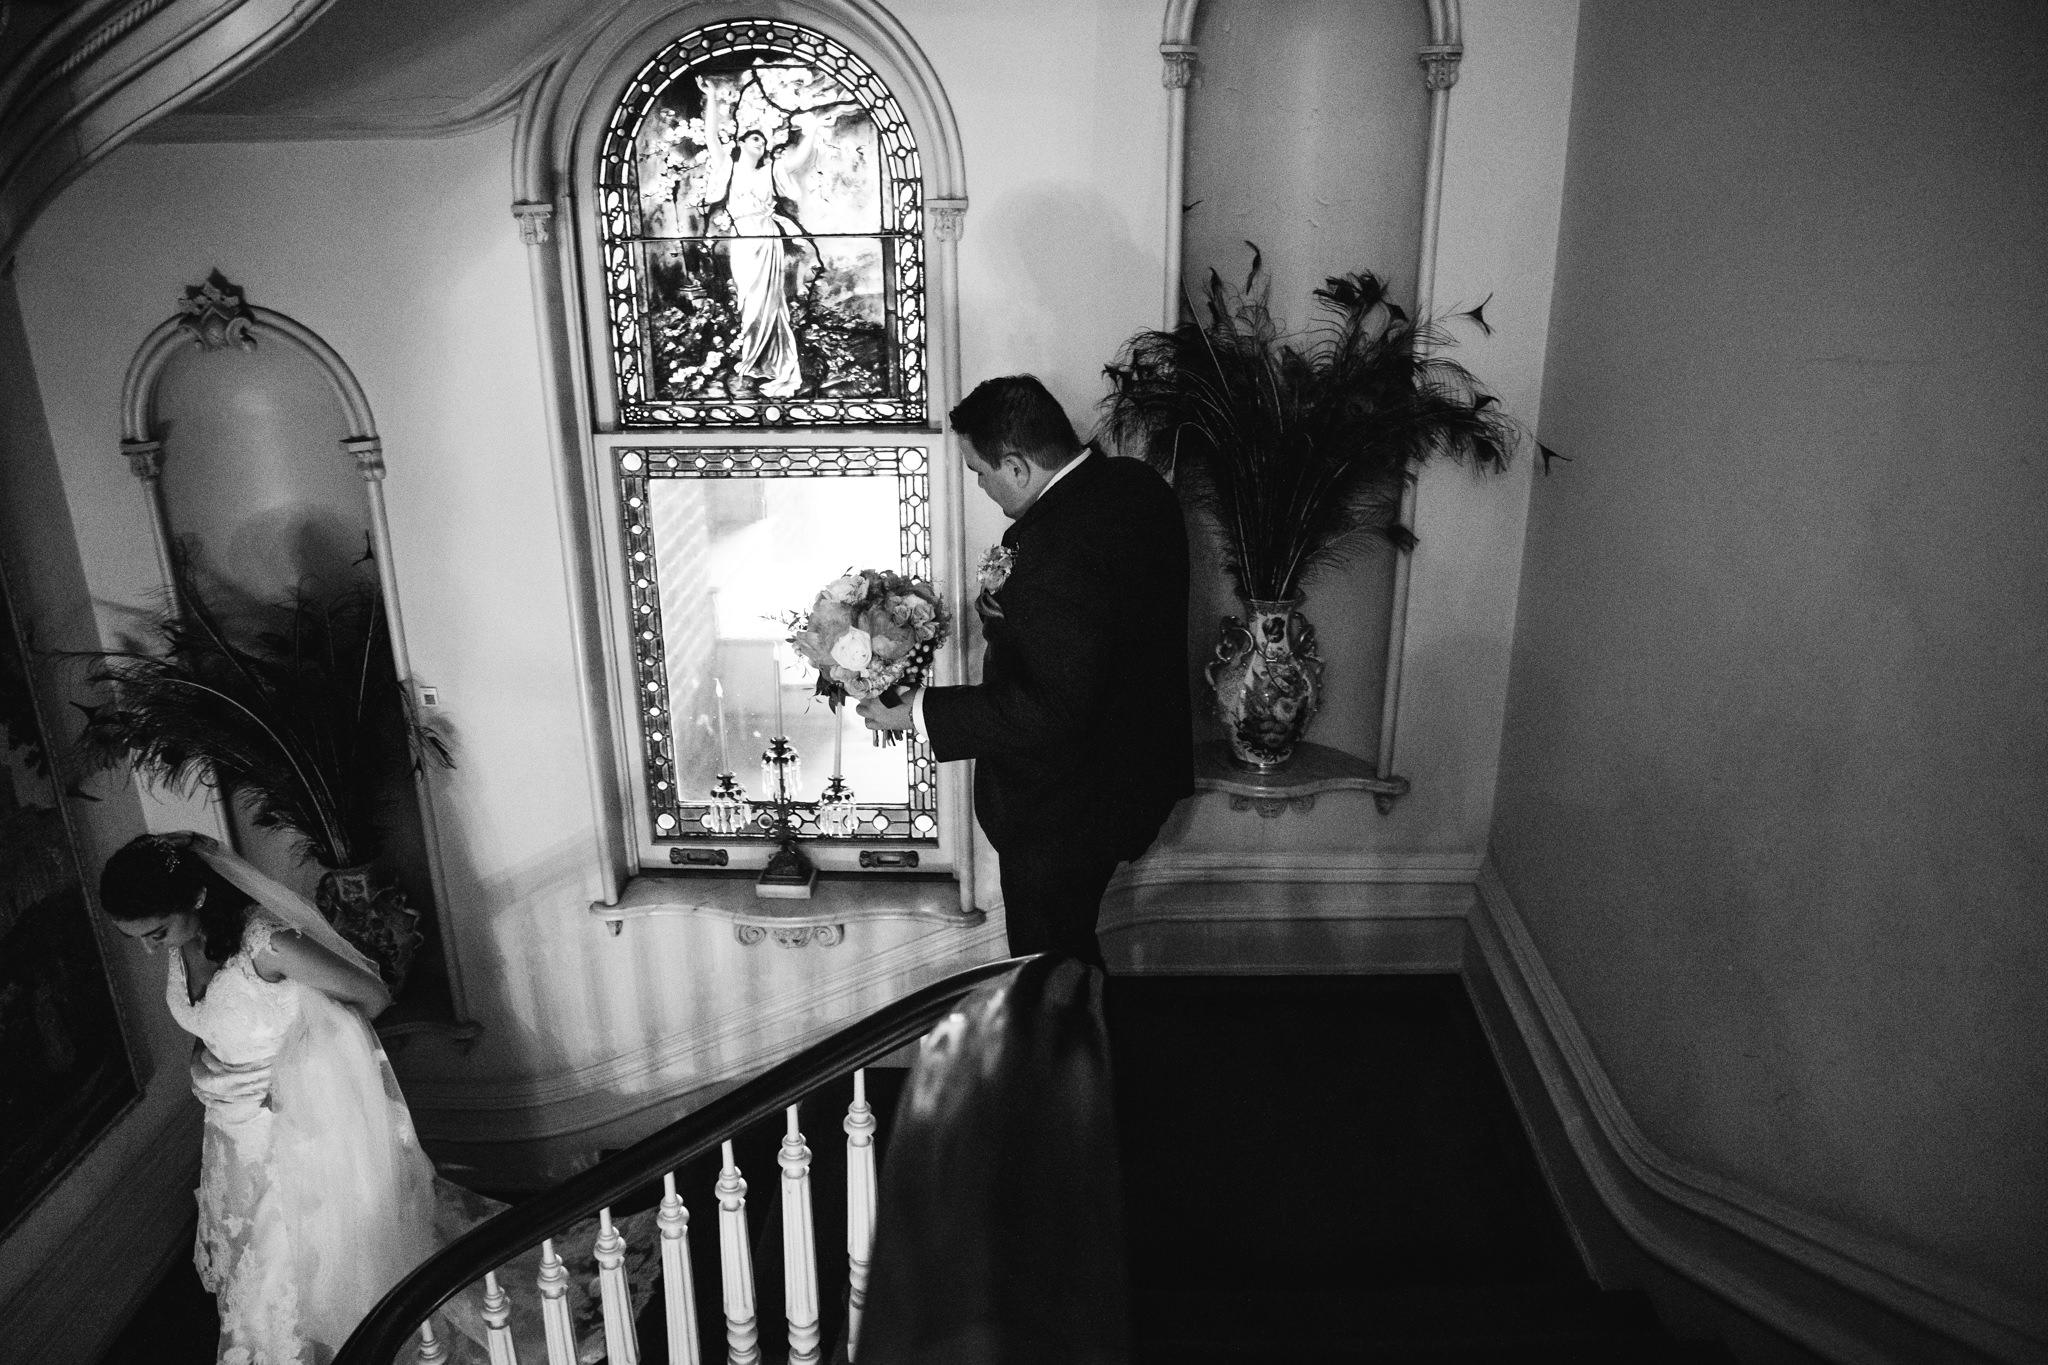 woodruff-fontaine-wedding-venue-memphis-thewarmtharoundyou-brenda-taylor-21.jpg